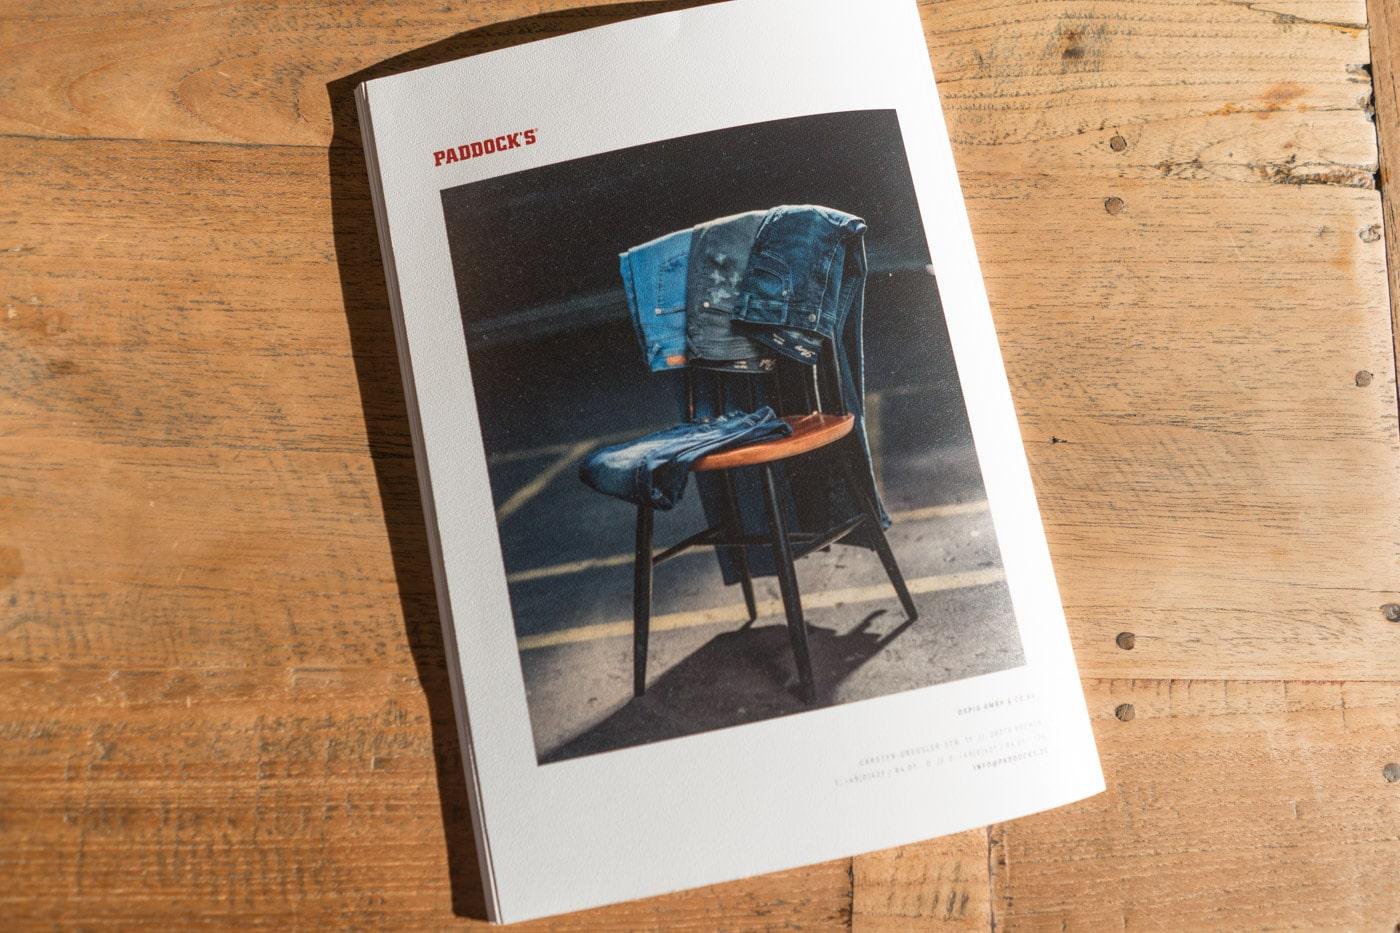 steffen_boettcher_paddocks_katalog-8